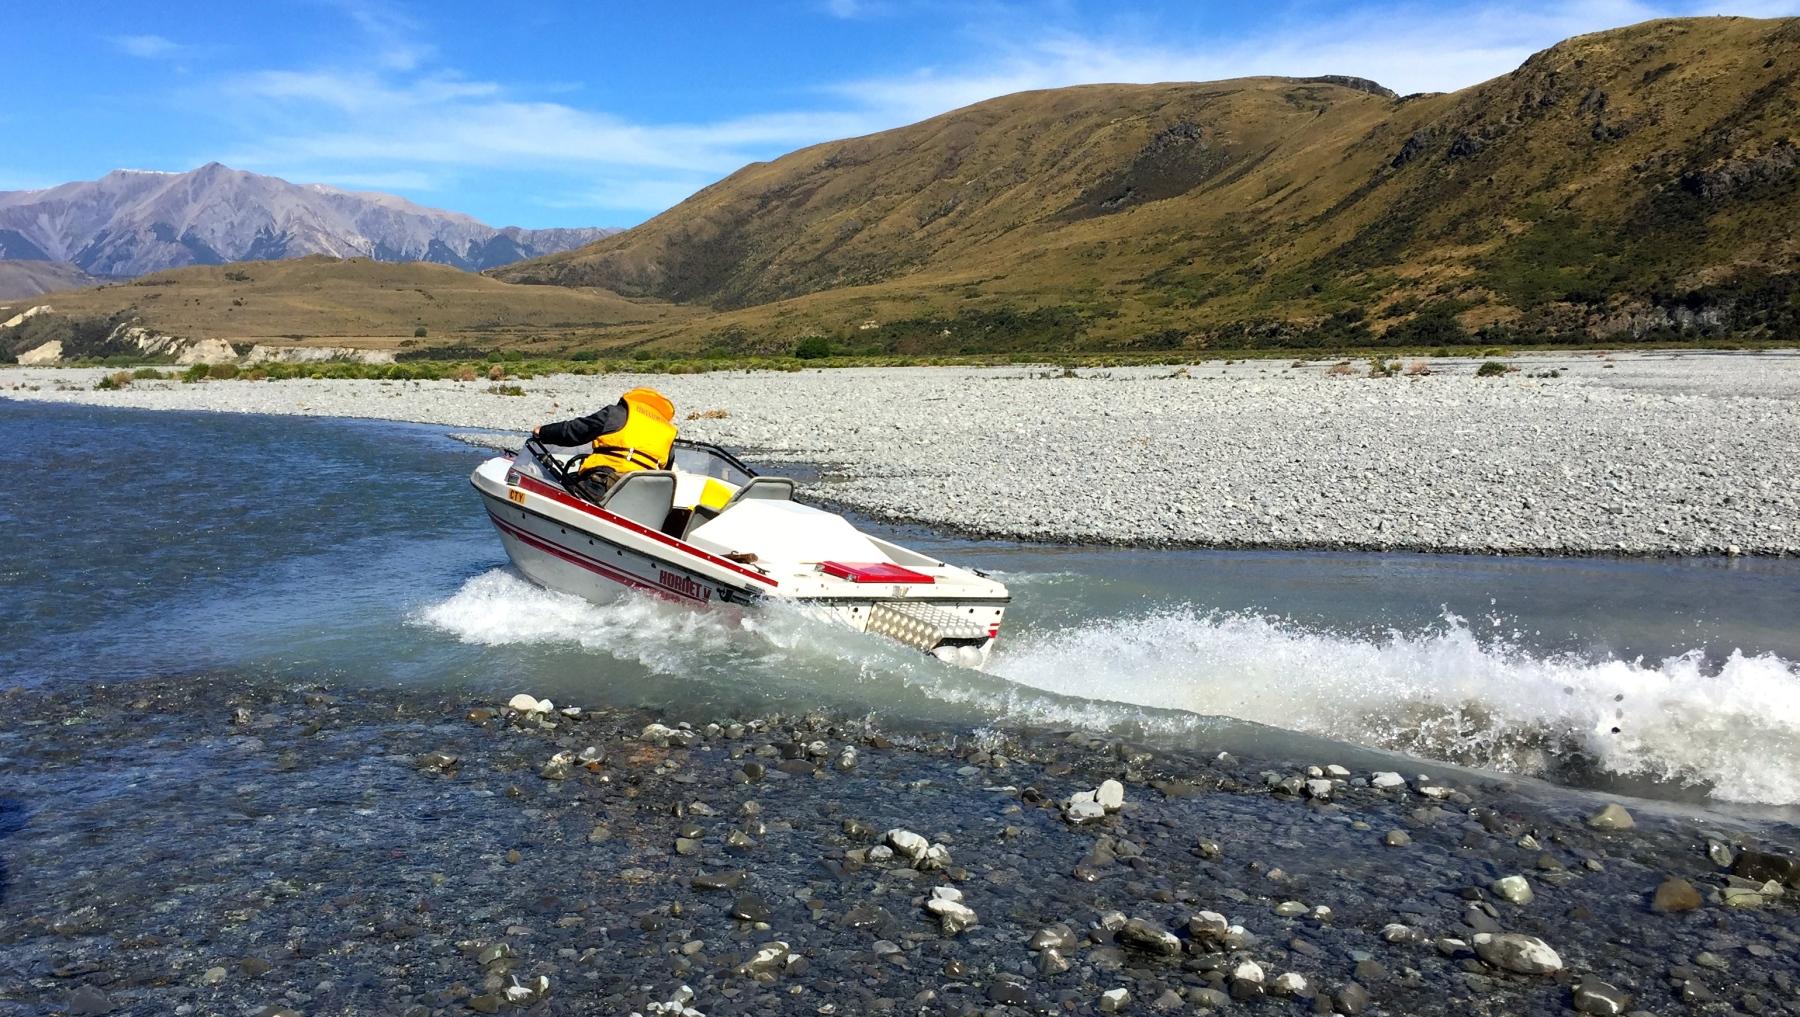 Wetlander Jet Boat going through rocky shallow water